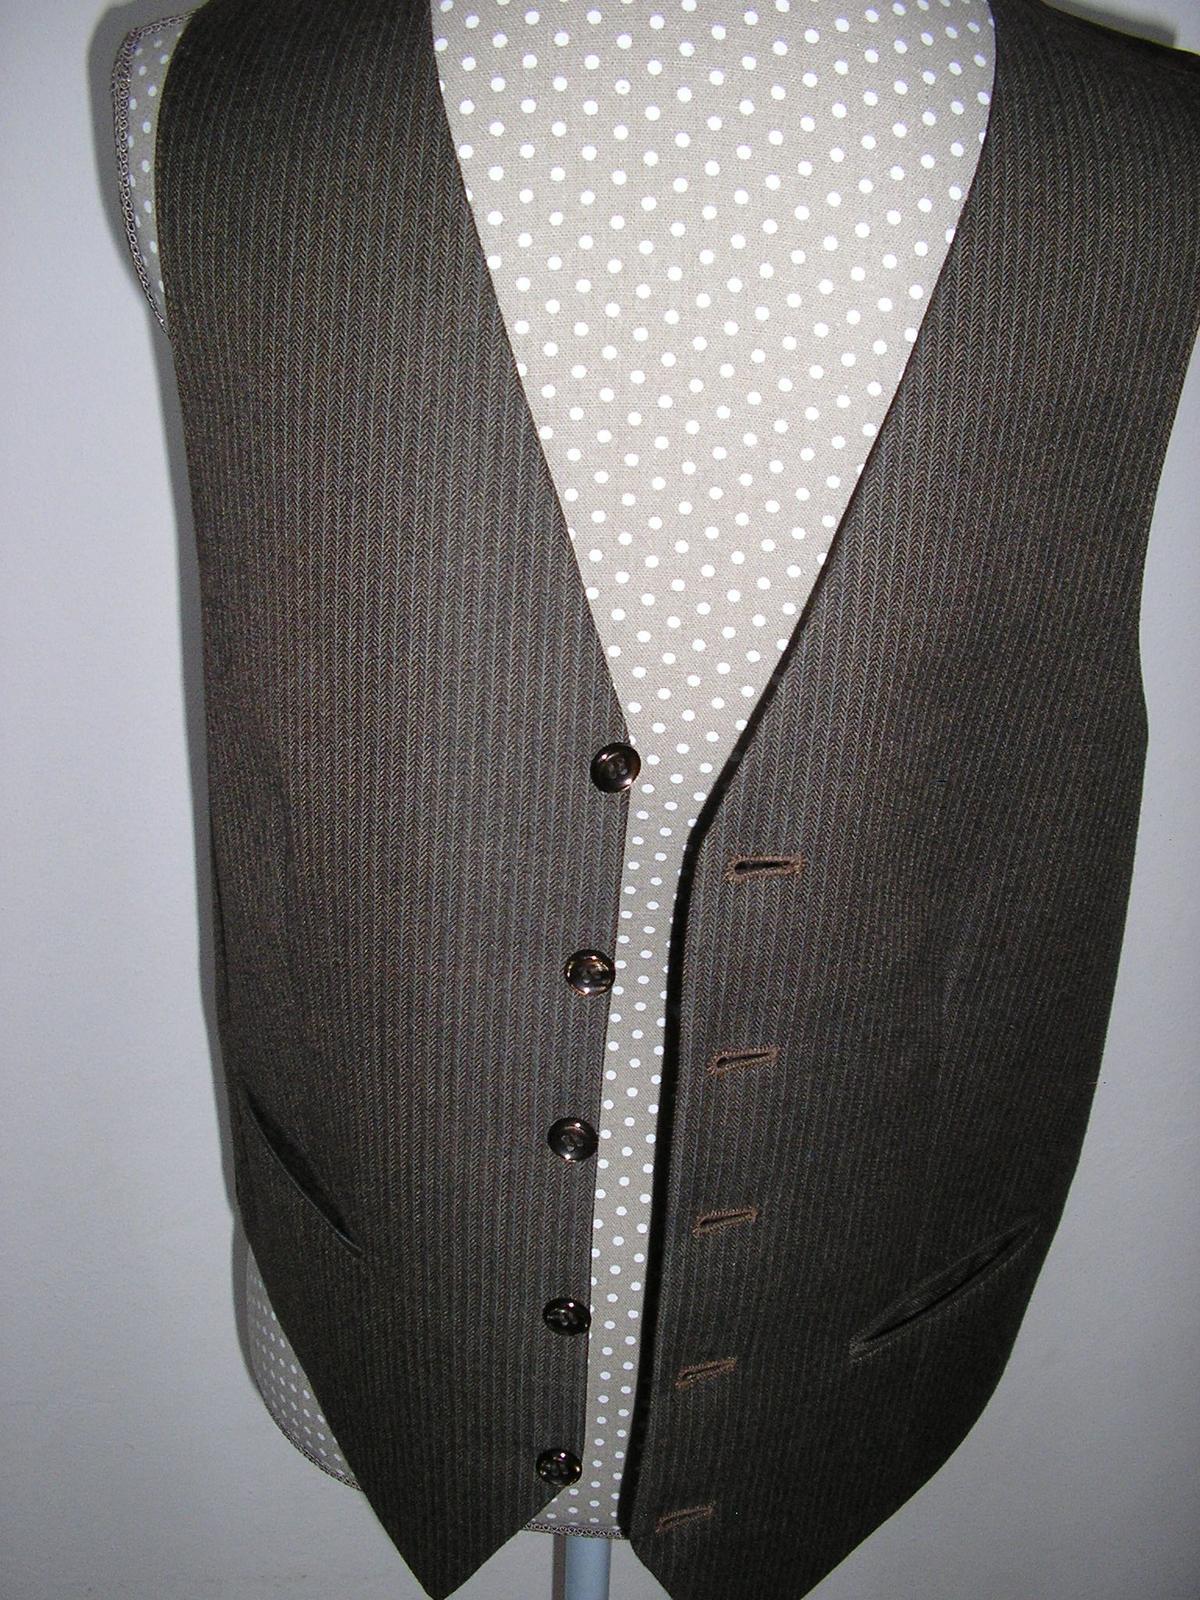 1210. Oblek pánsky - Obrázok č. 4